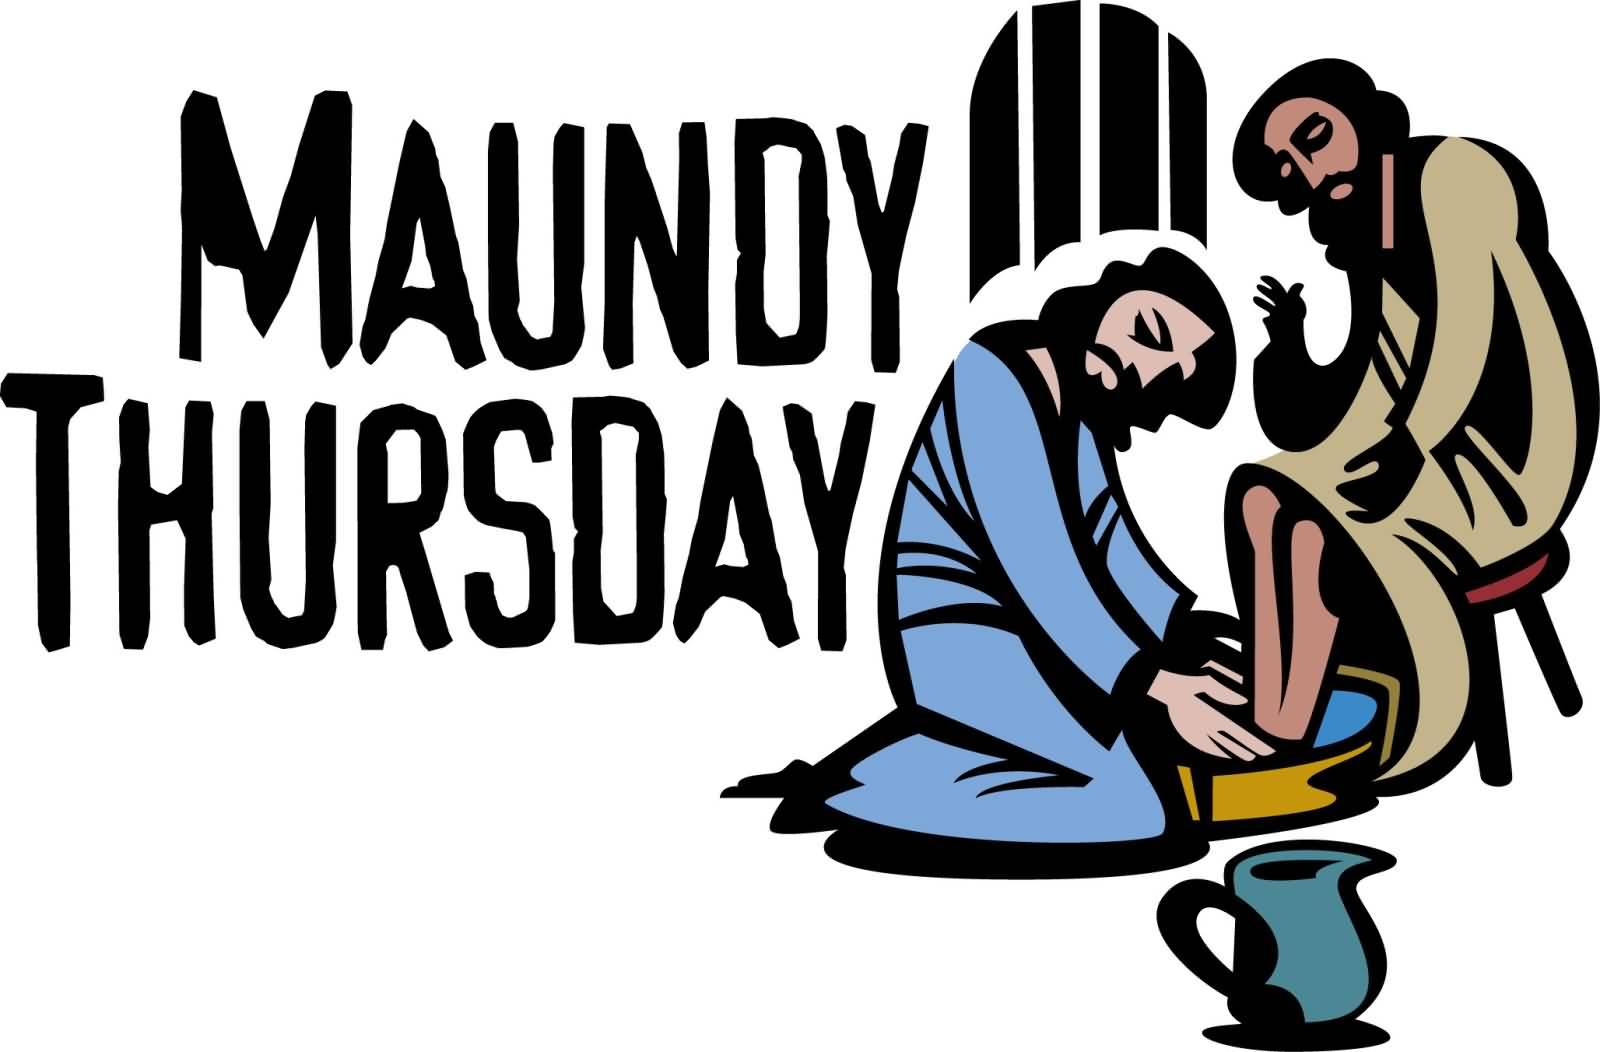 maundy thursday - photo #42